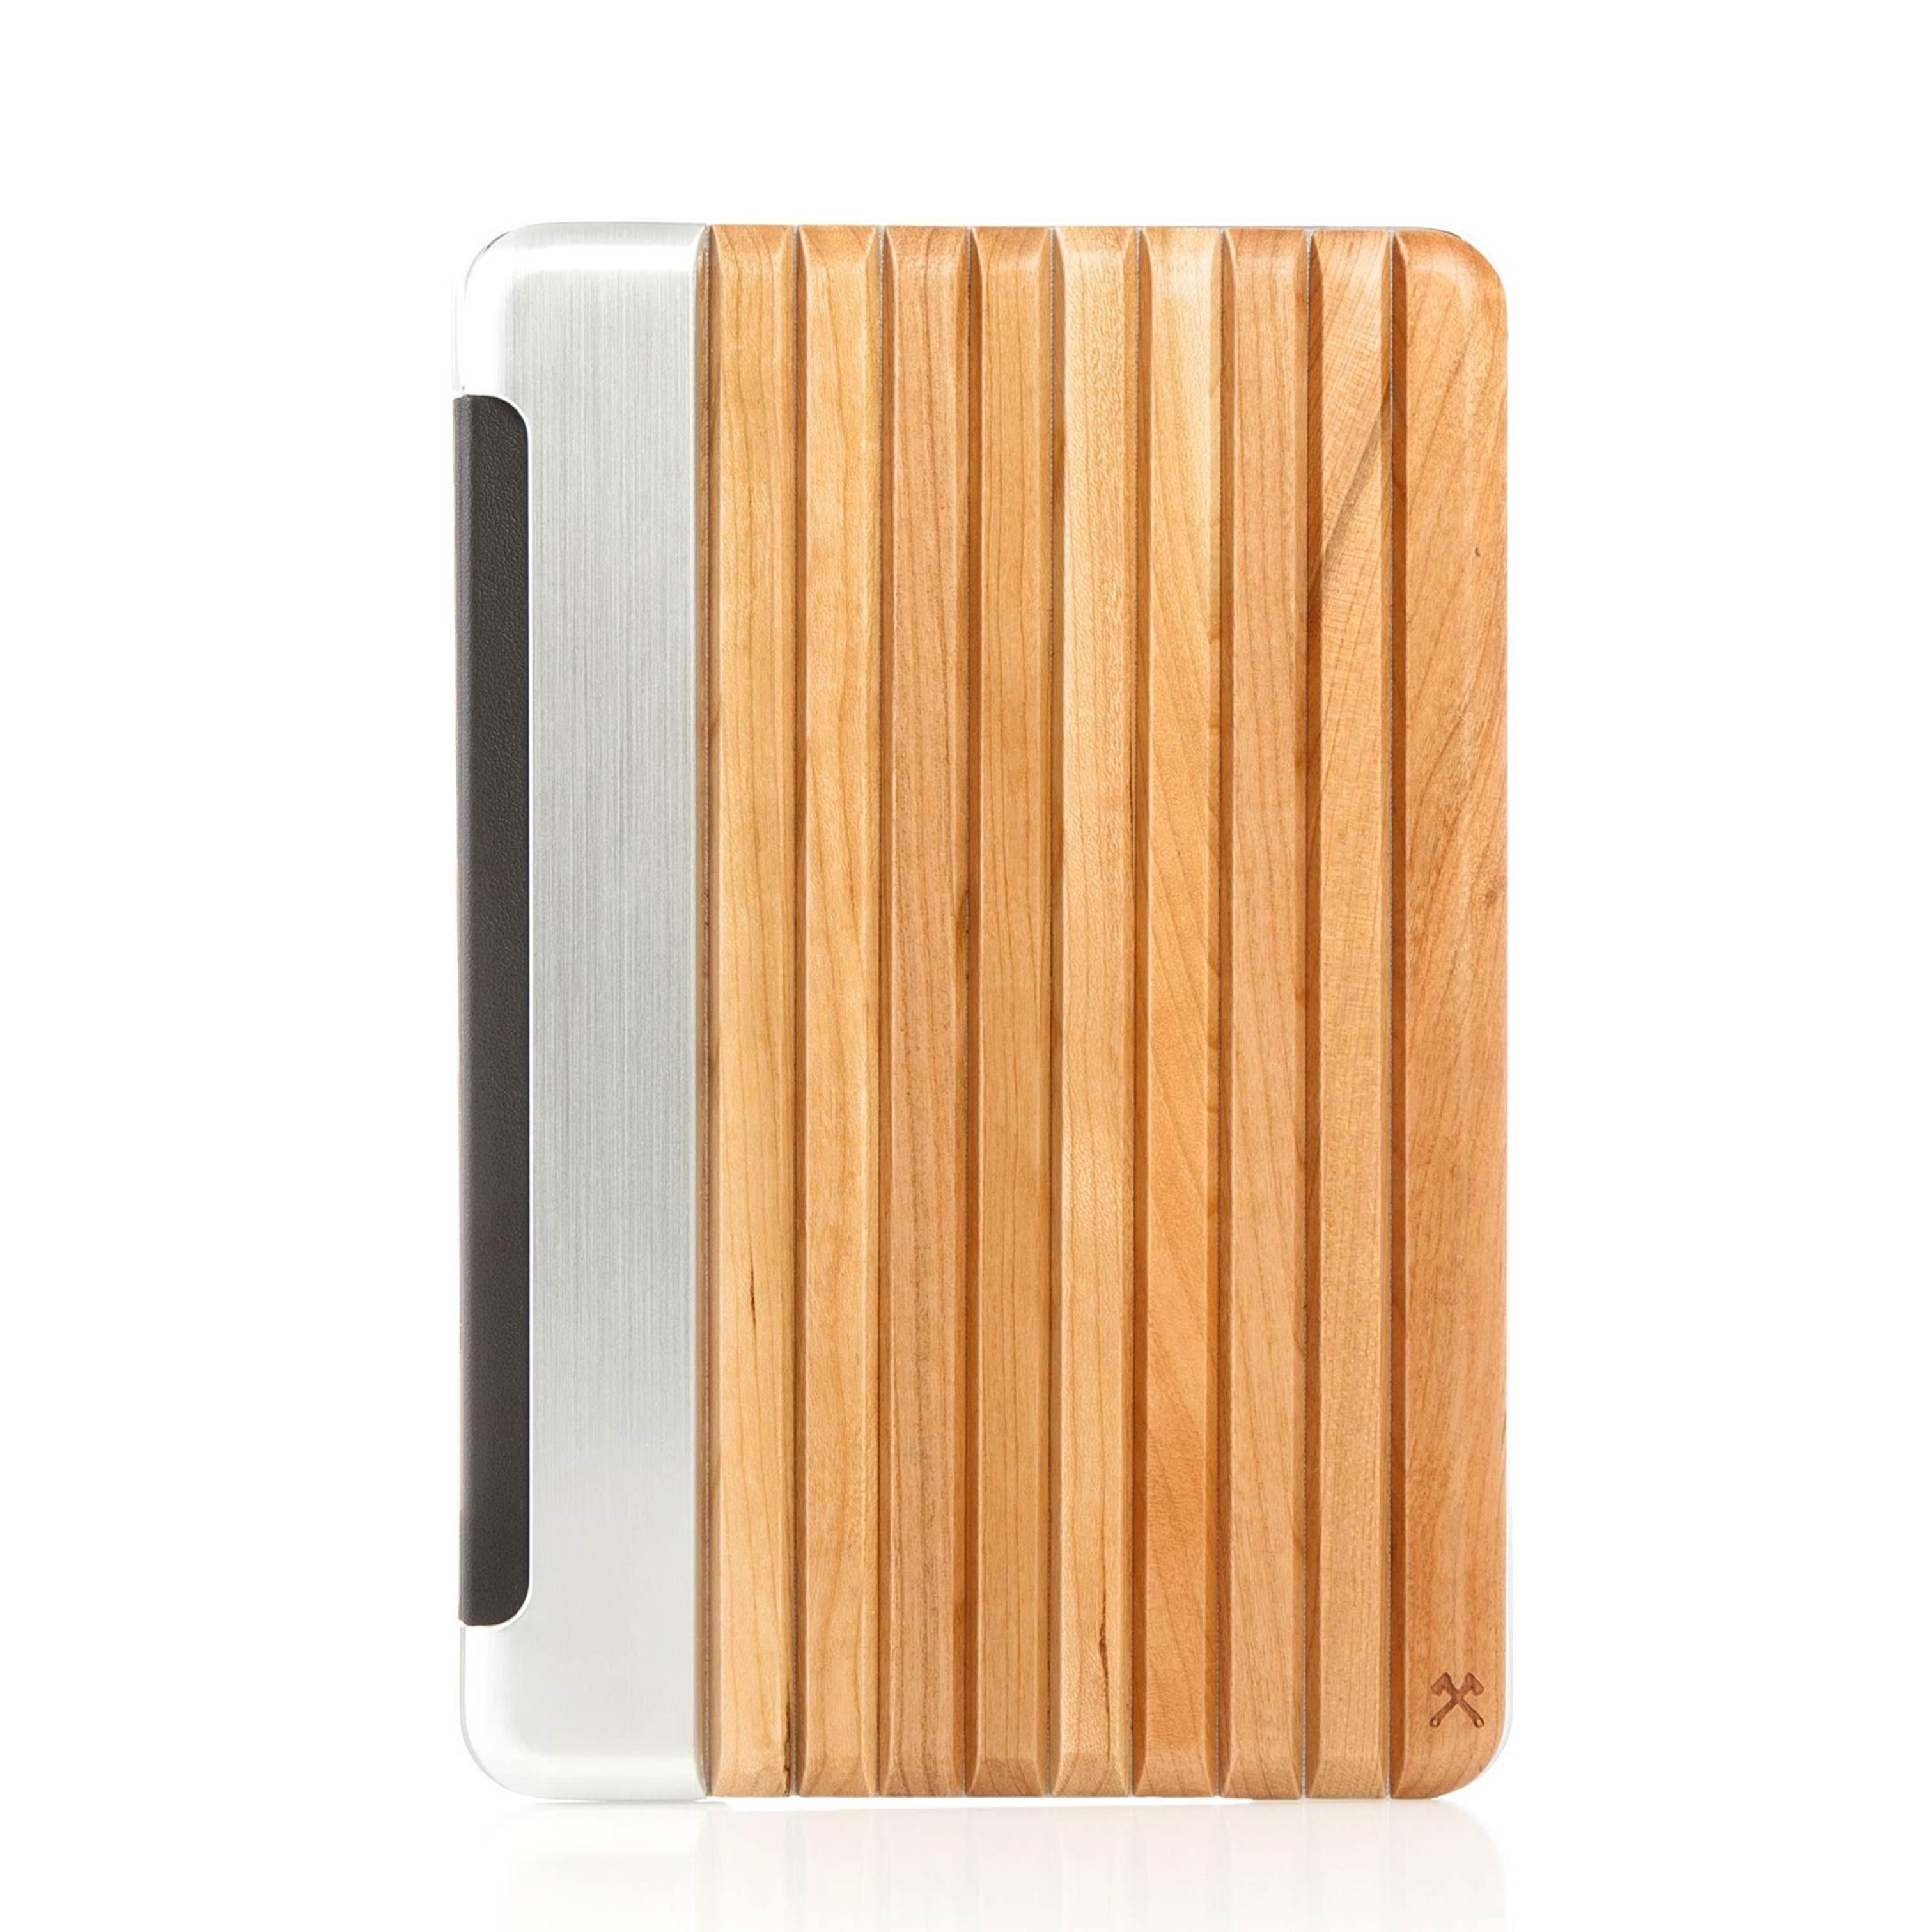 Woodcessories EcoGuard - Echtholz Case für iPad Mini 4